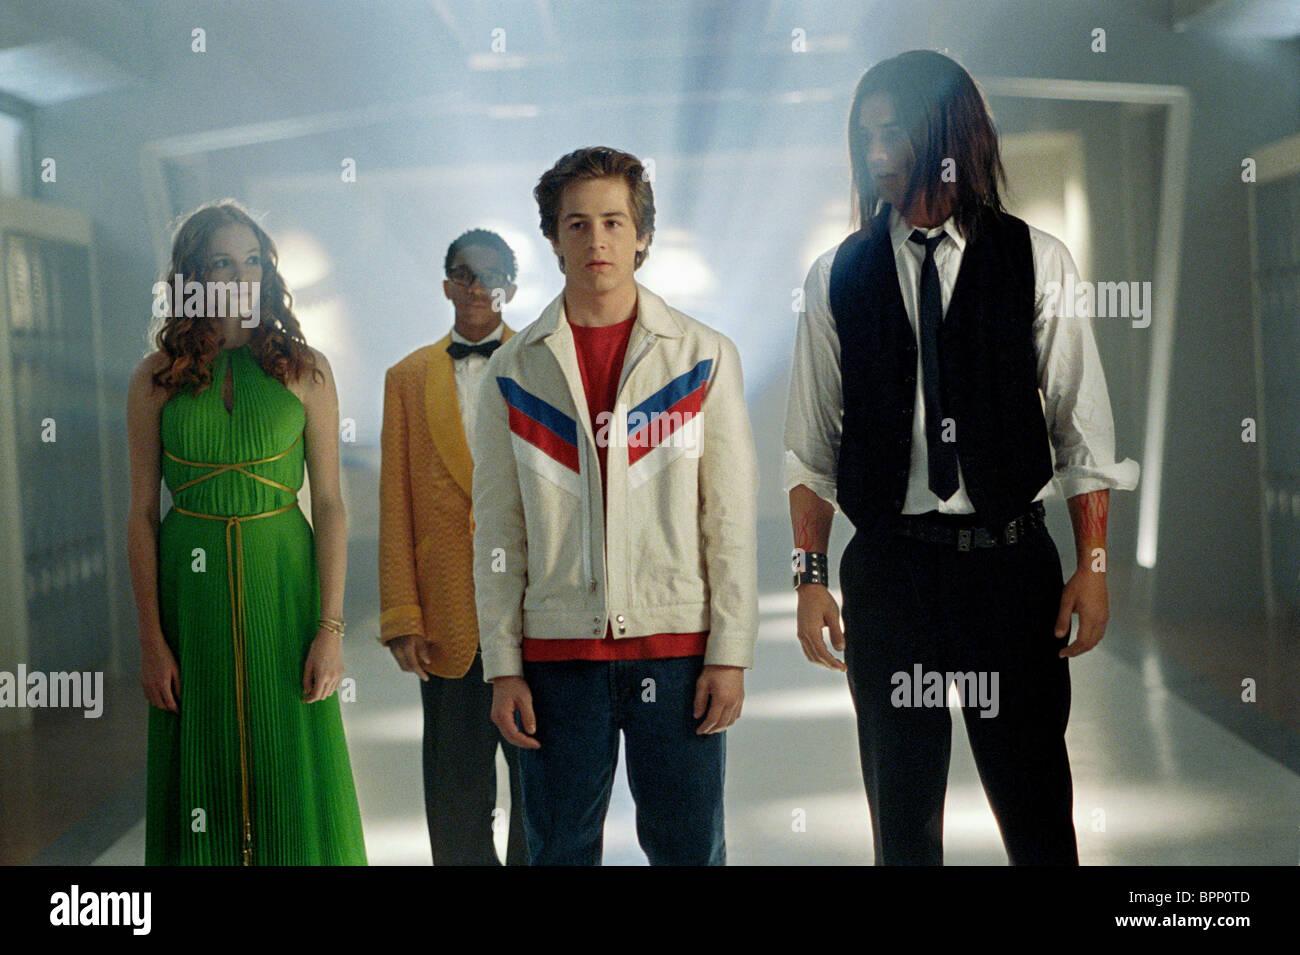 Cineplex.com | One Last Thing